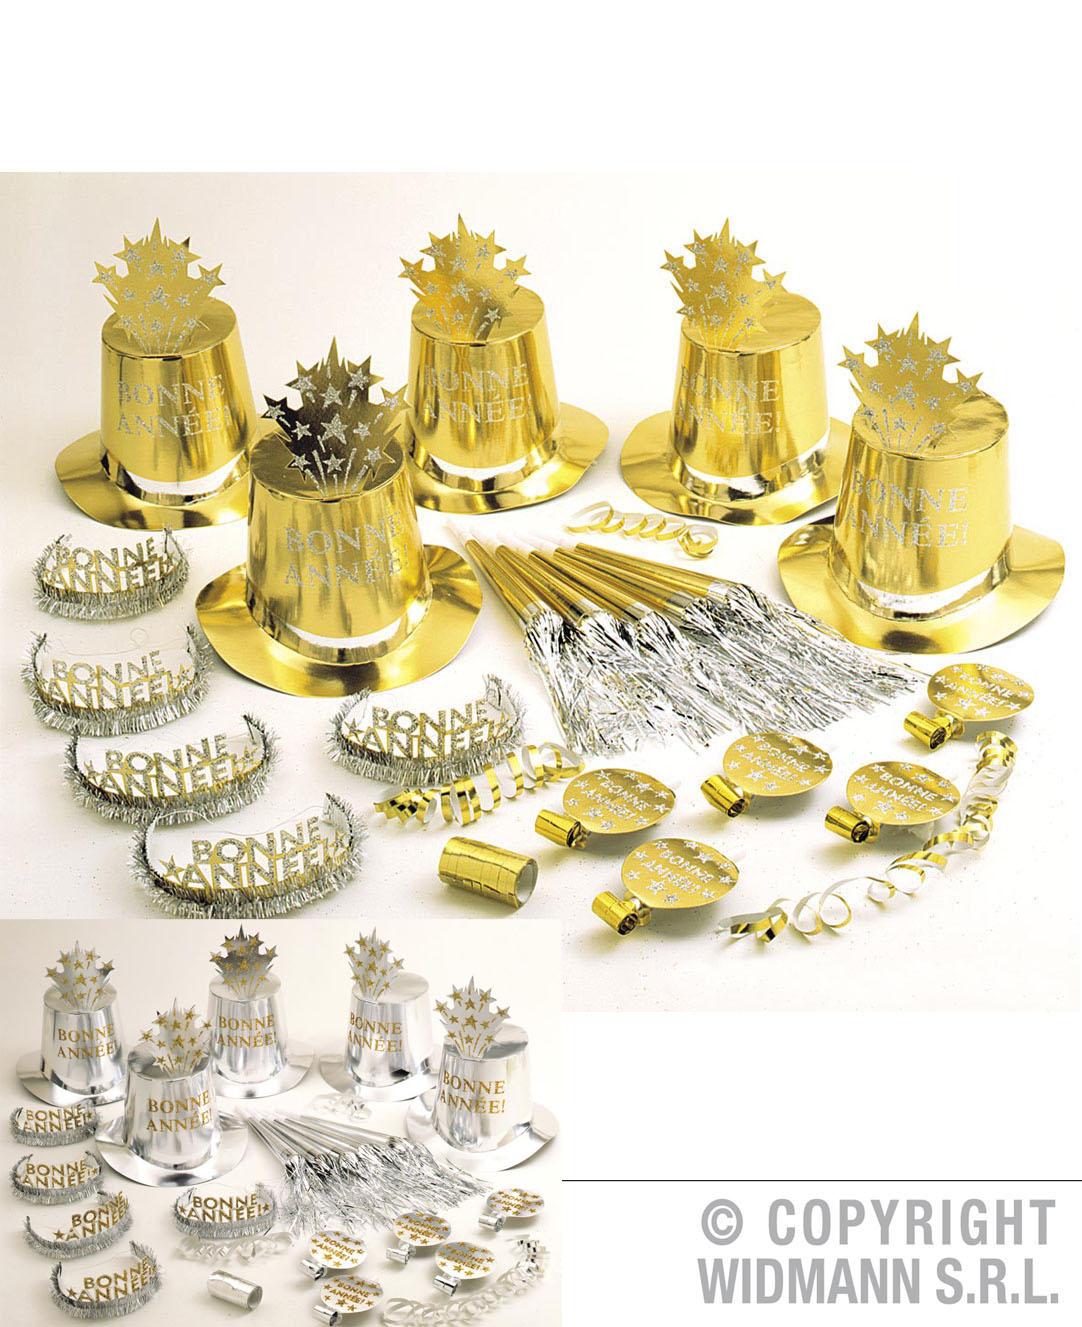 30tlg.Silvester Party Set,Zylinder,Krone,Trompete..10 Personen silber,gold